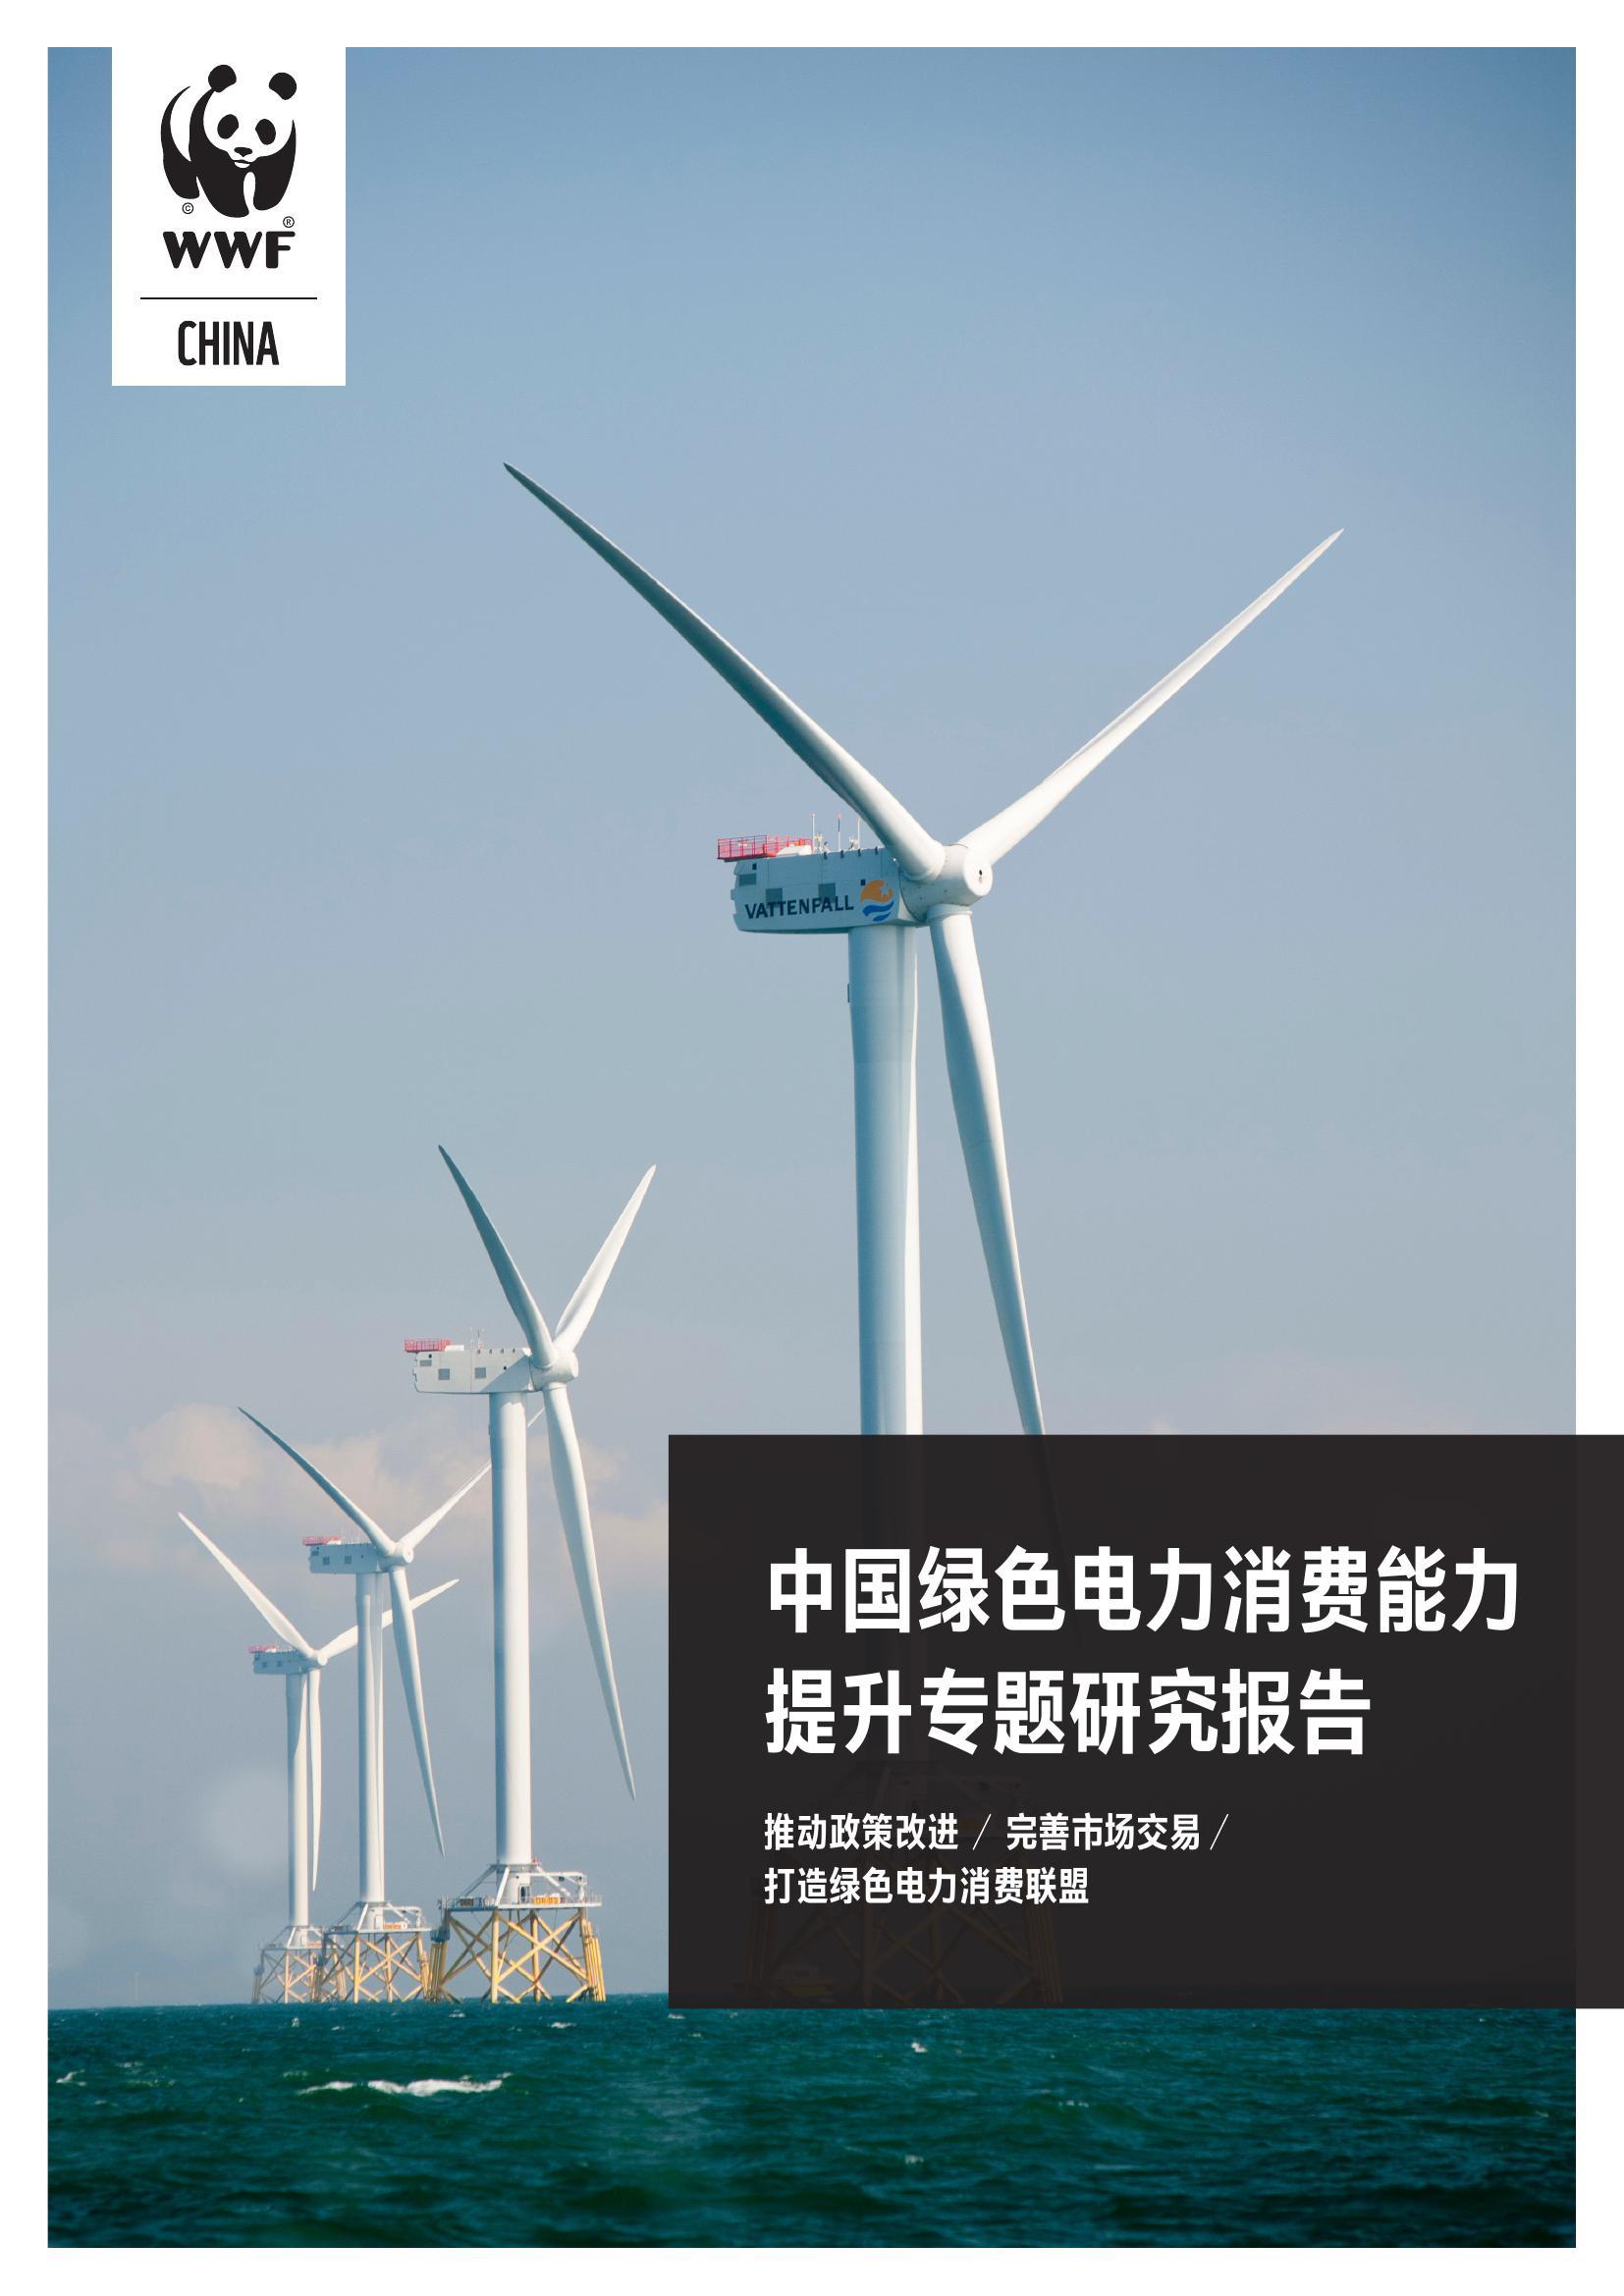 WWF:中国绿色电力消费能力提升专题研究报告